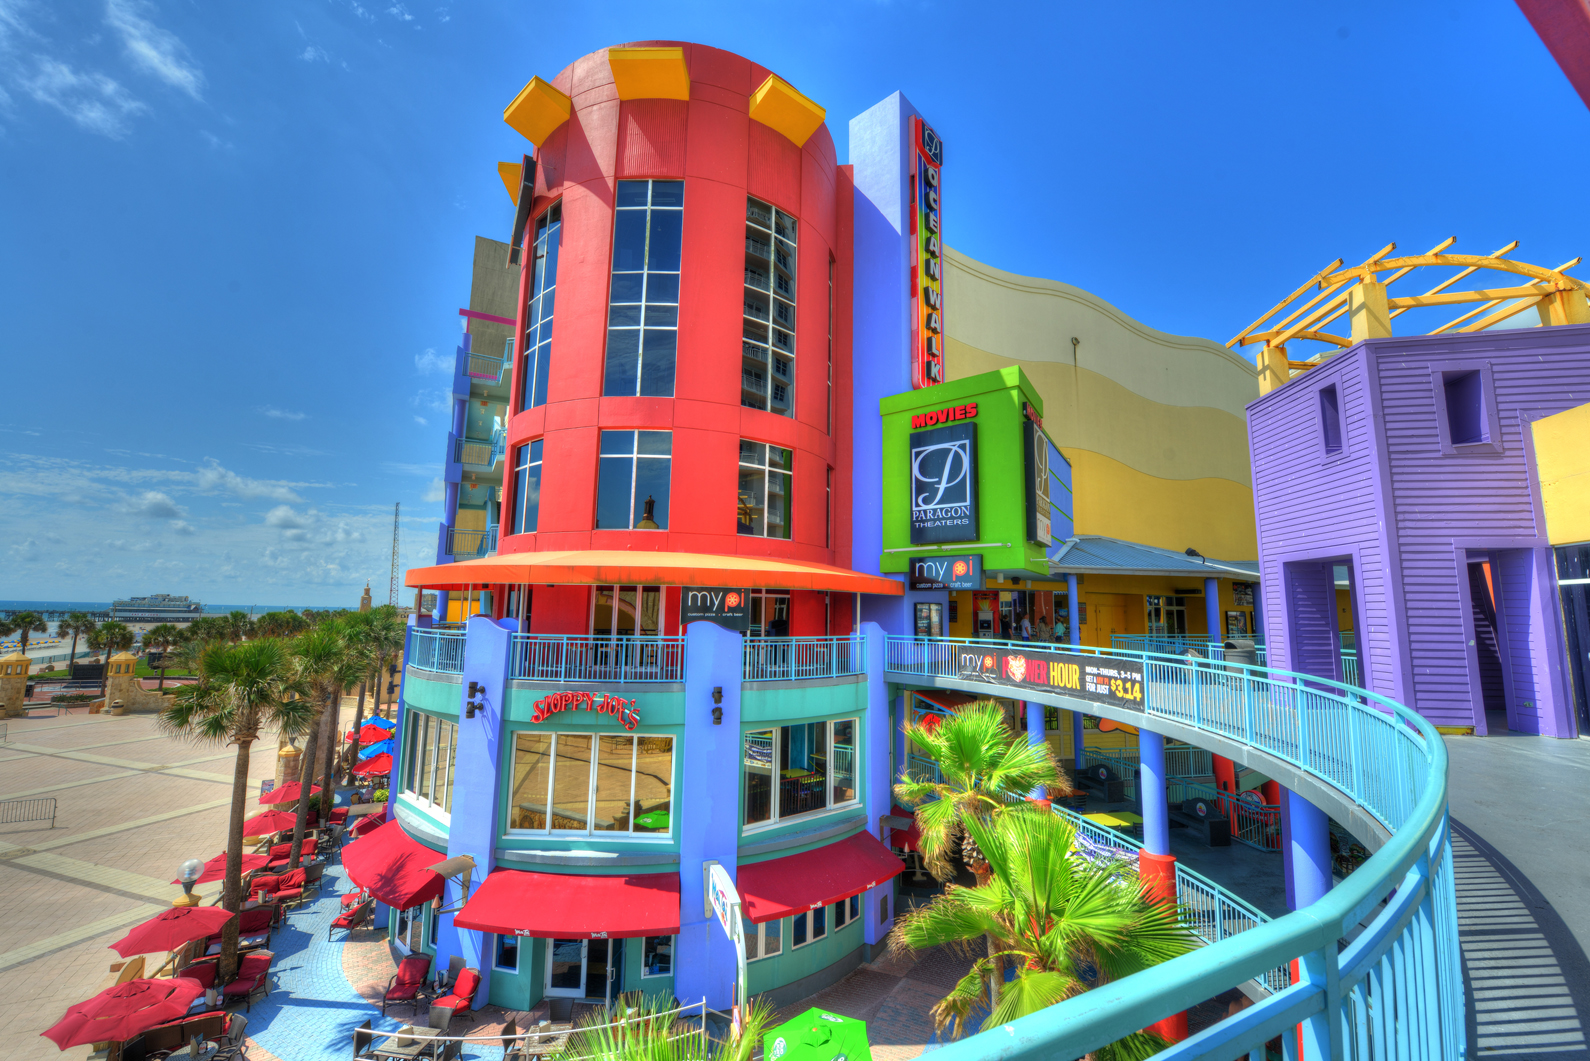 Credit Daytona Beach CVB (3)